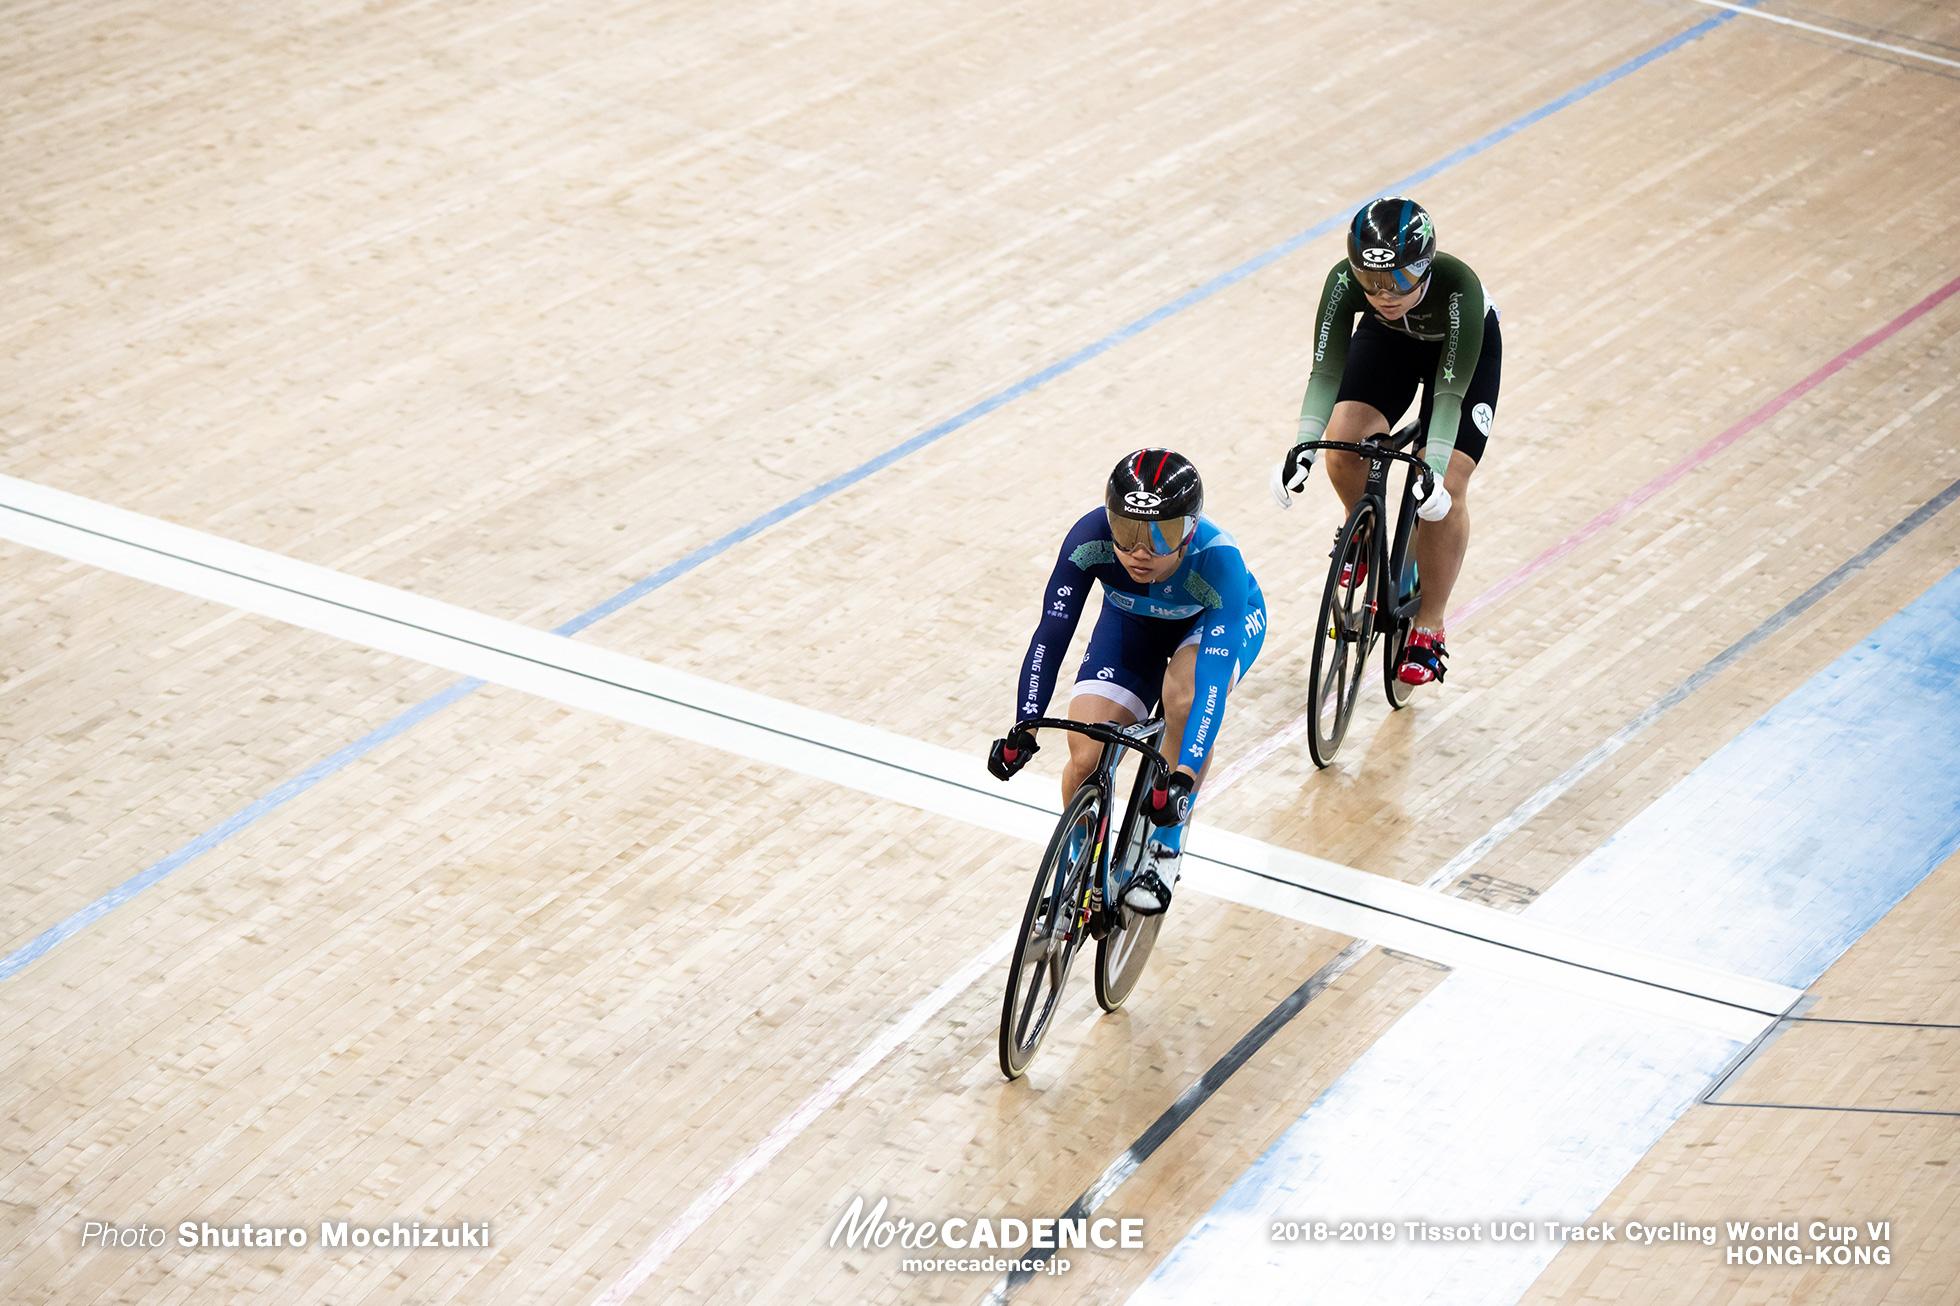 2nd Round / Women's Sprint / Track Cycling World Cup VI / Hong-Kong